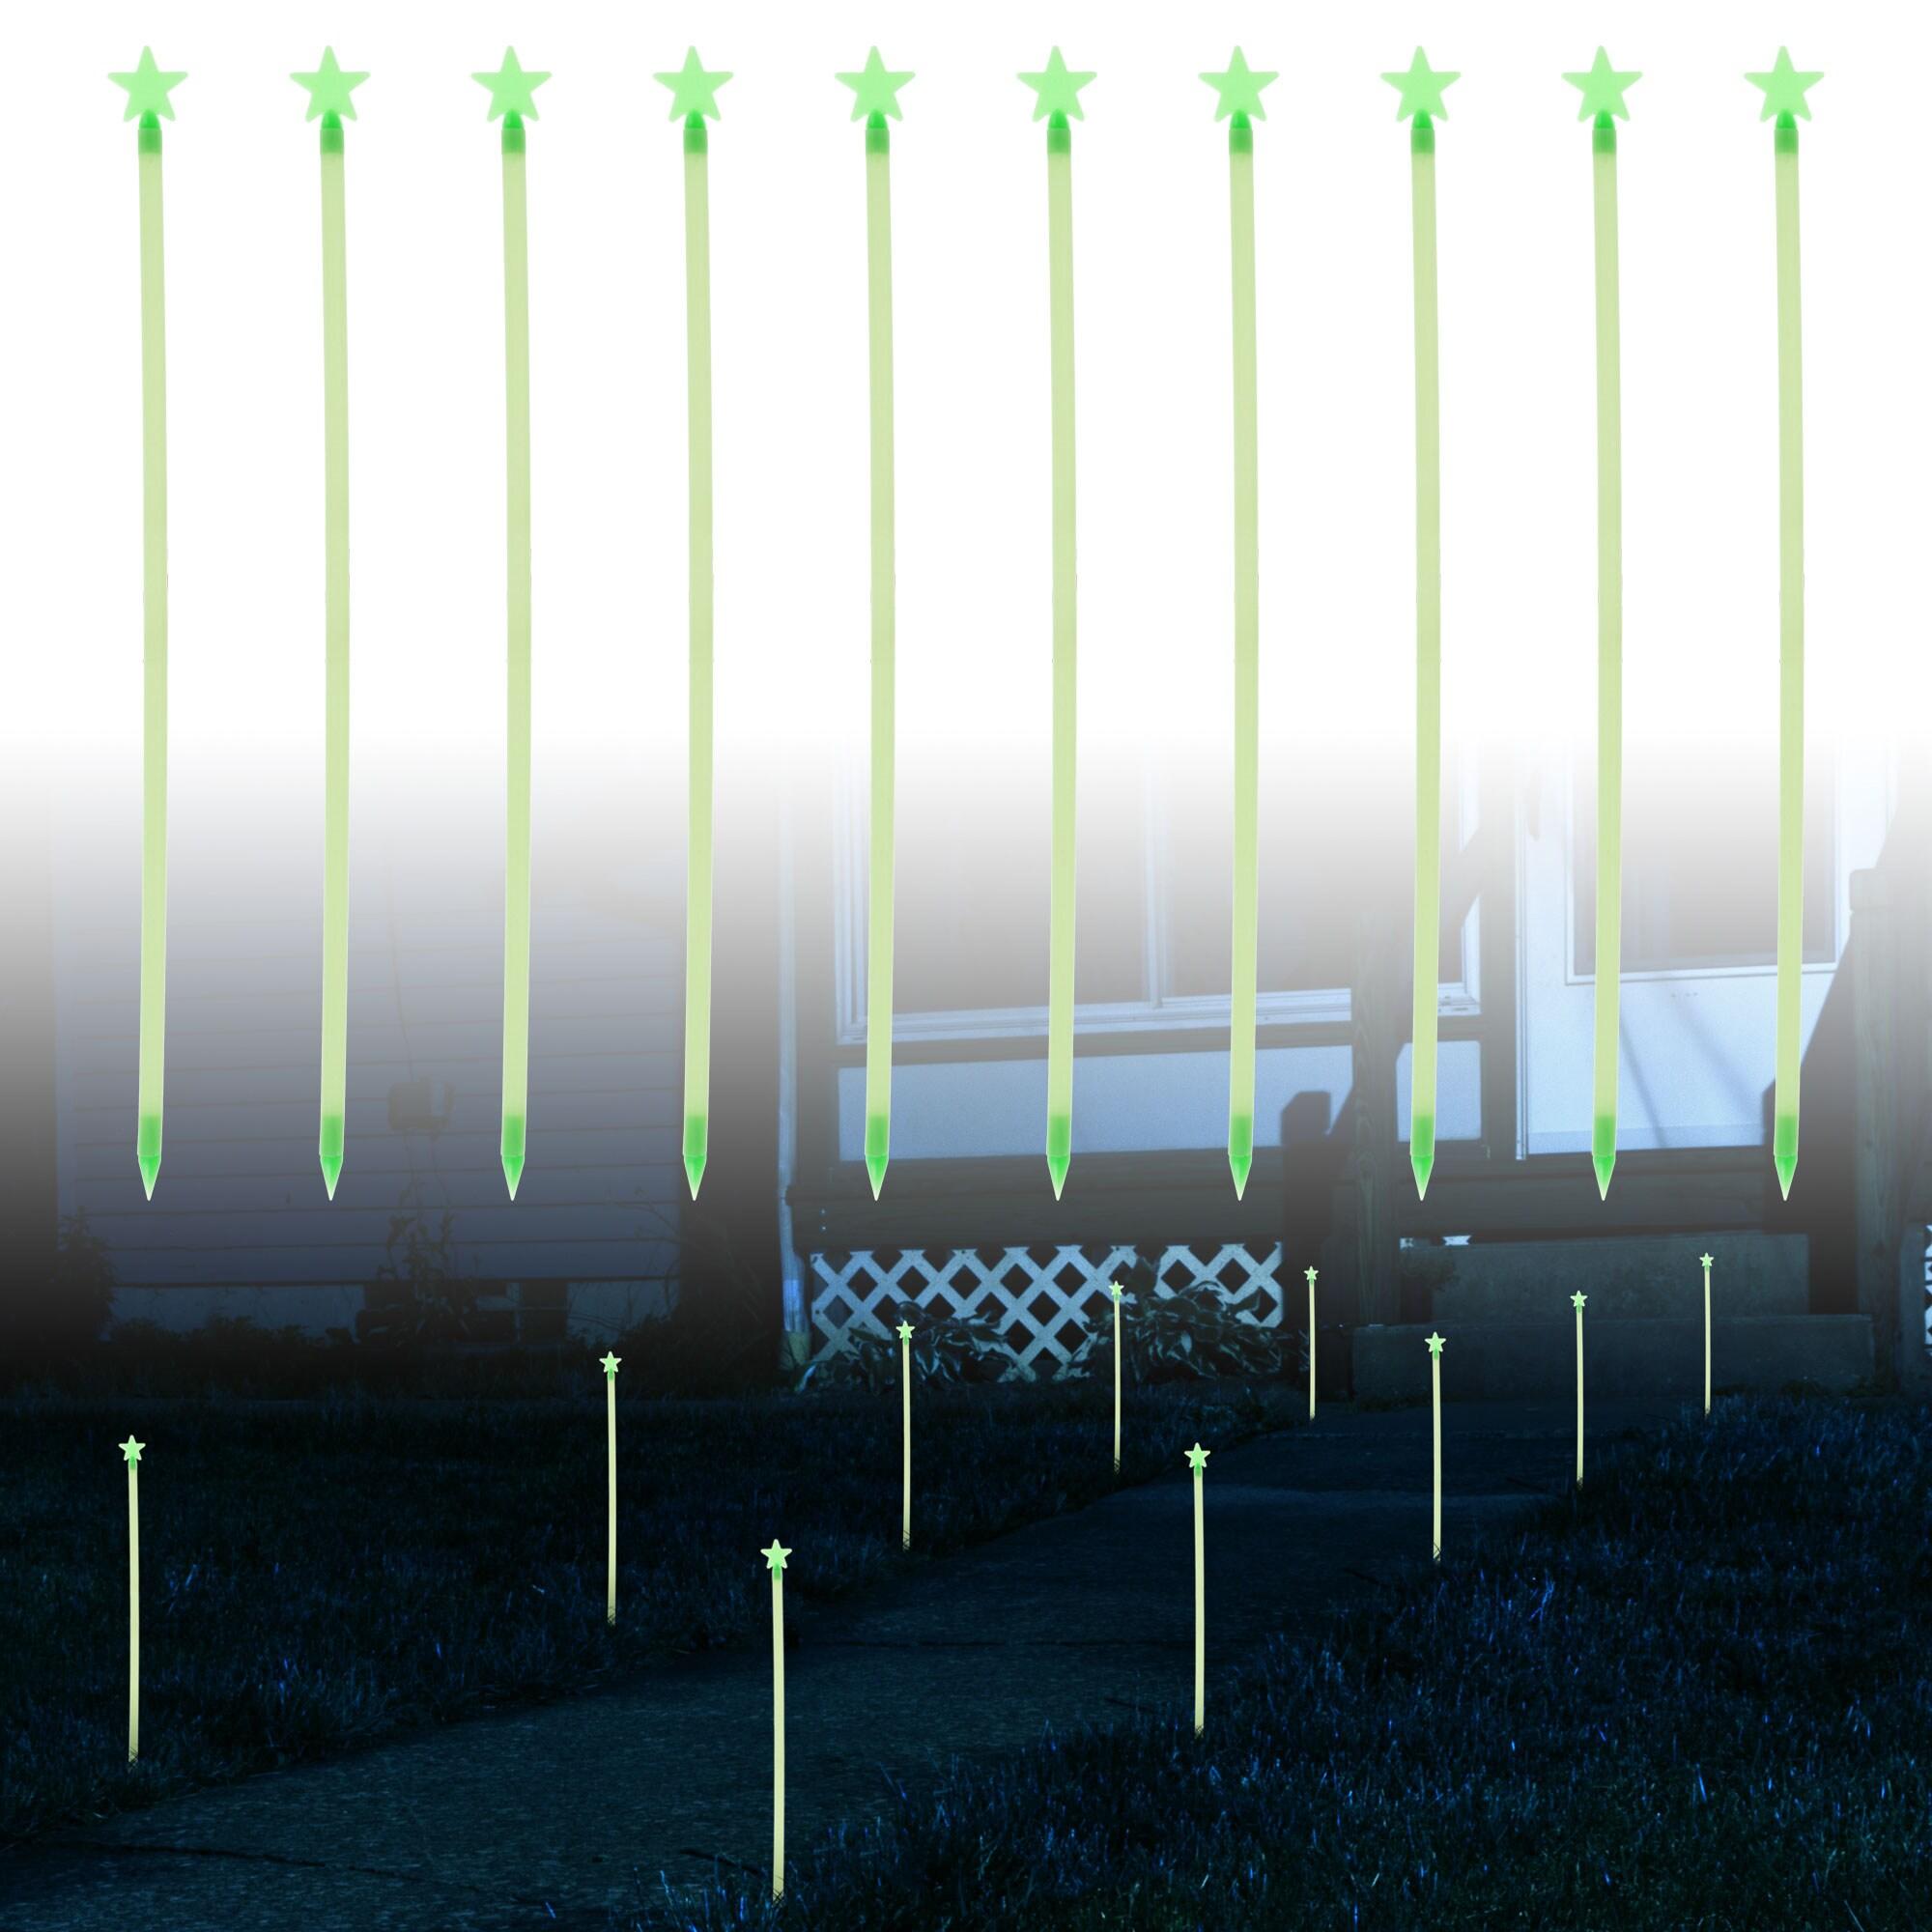 TerraTrade Glow-in-the-dark Star Path Marker Rods (Set of 10)